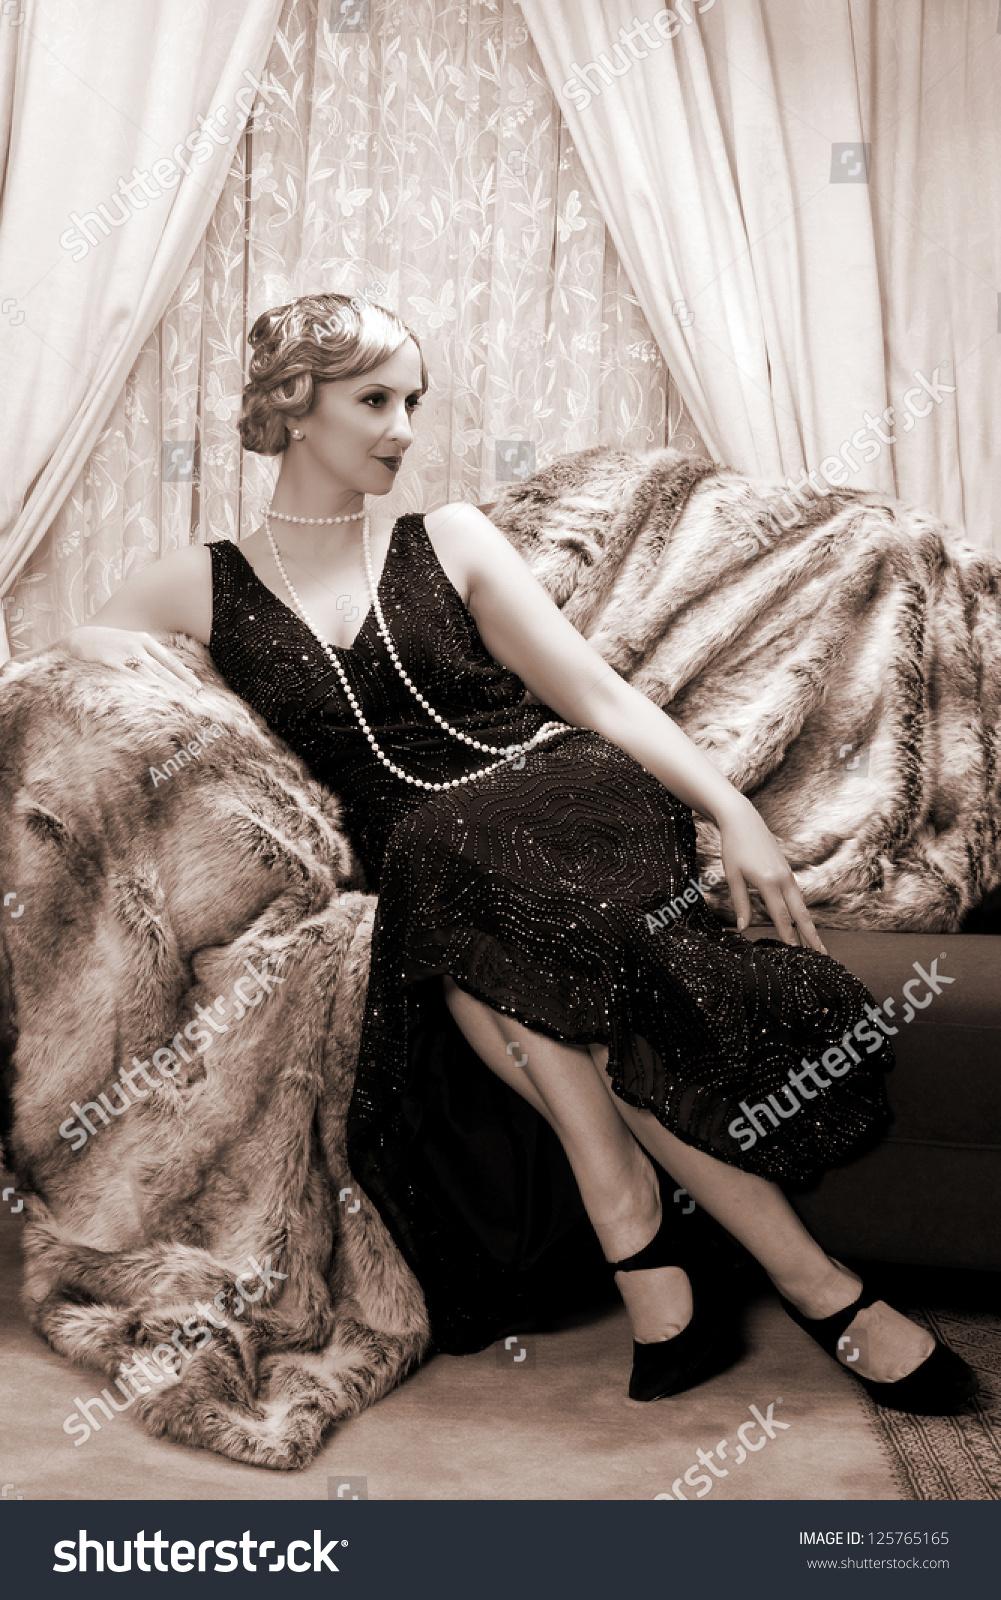 Reenactment Vintage Scene Lady Roaring Twenties Stock Photo (Royalty ...